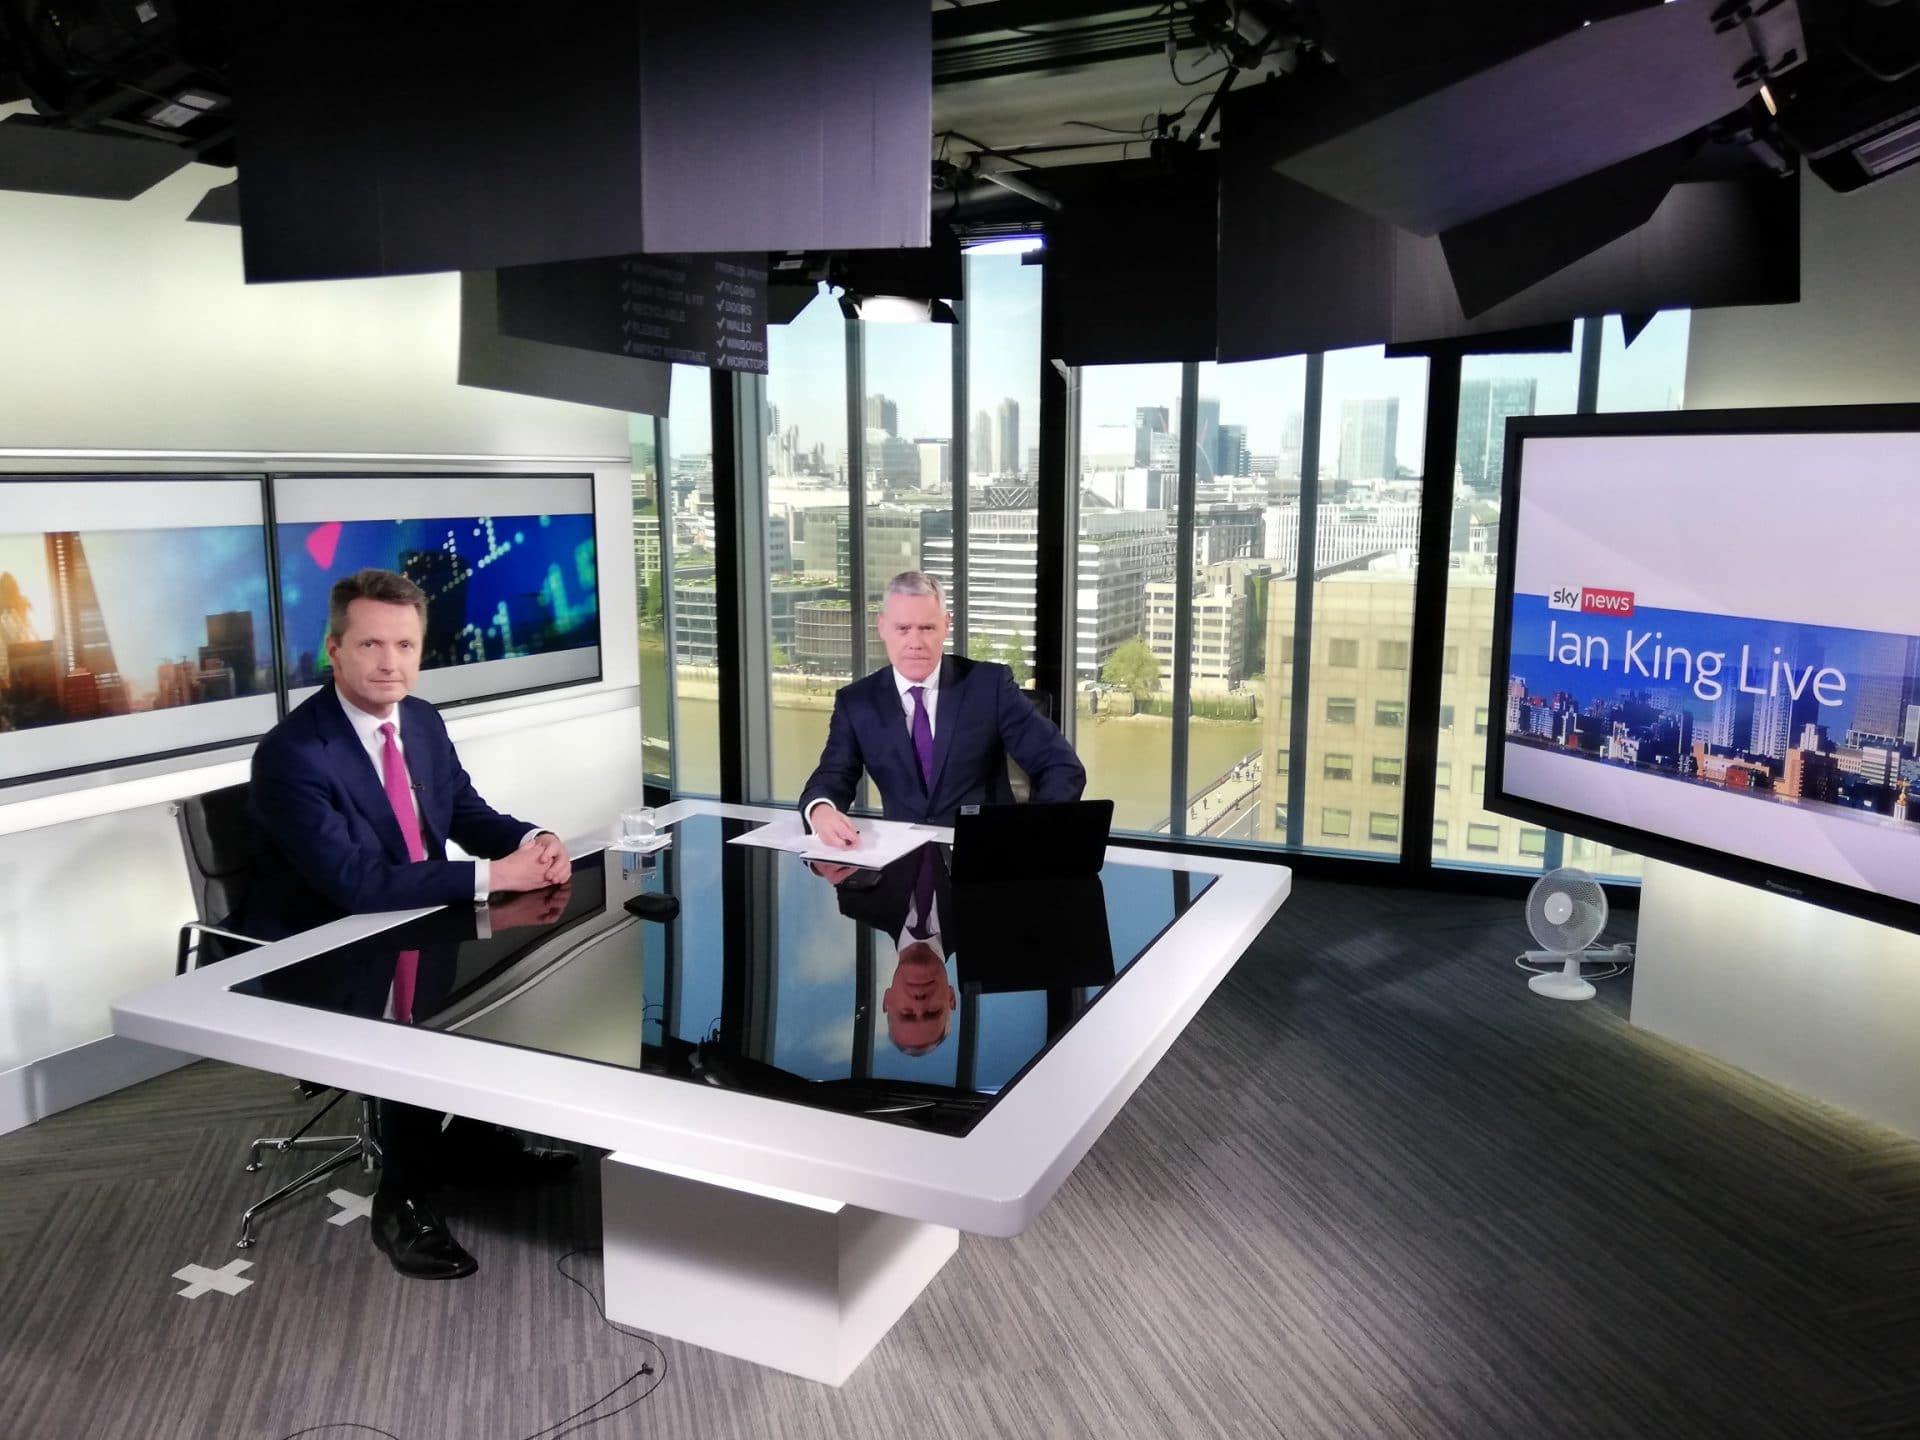 Sky News - Chris Manson & Ian King